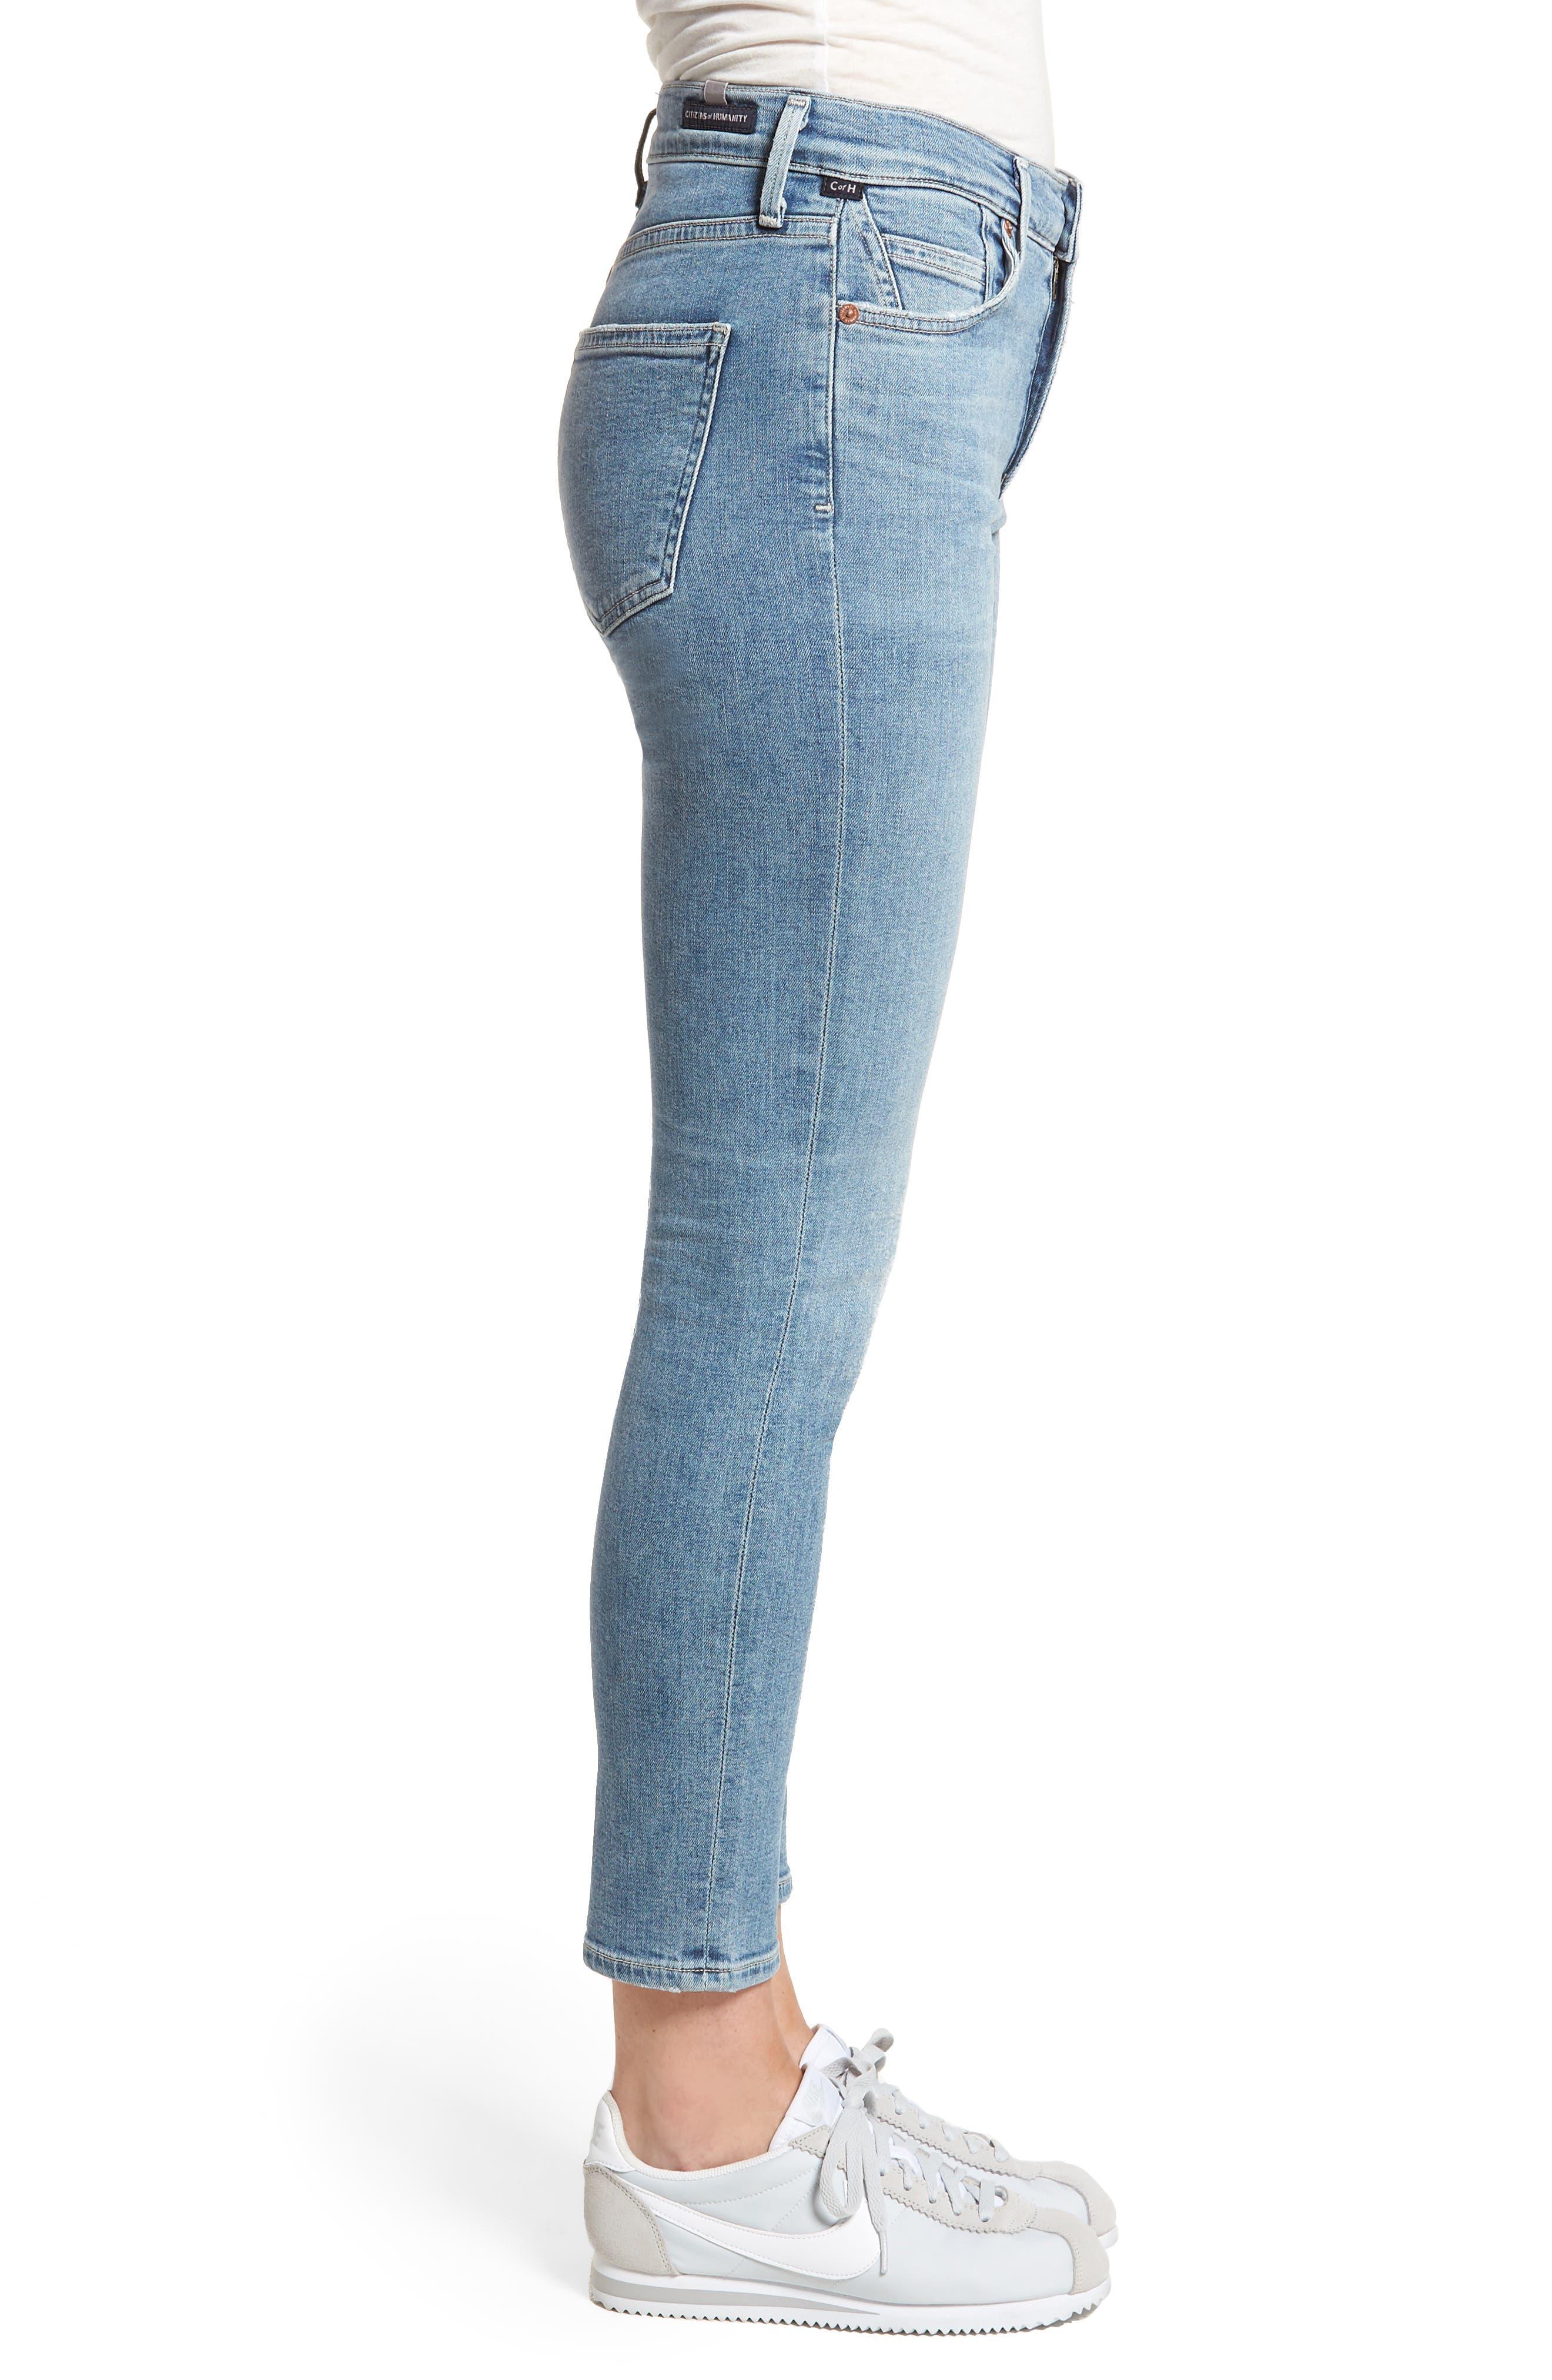 Rocket High Waist Crop Skinny Jeans,                             Alternate thumbnail 3, color,                             Firestone